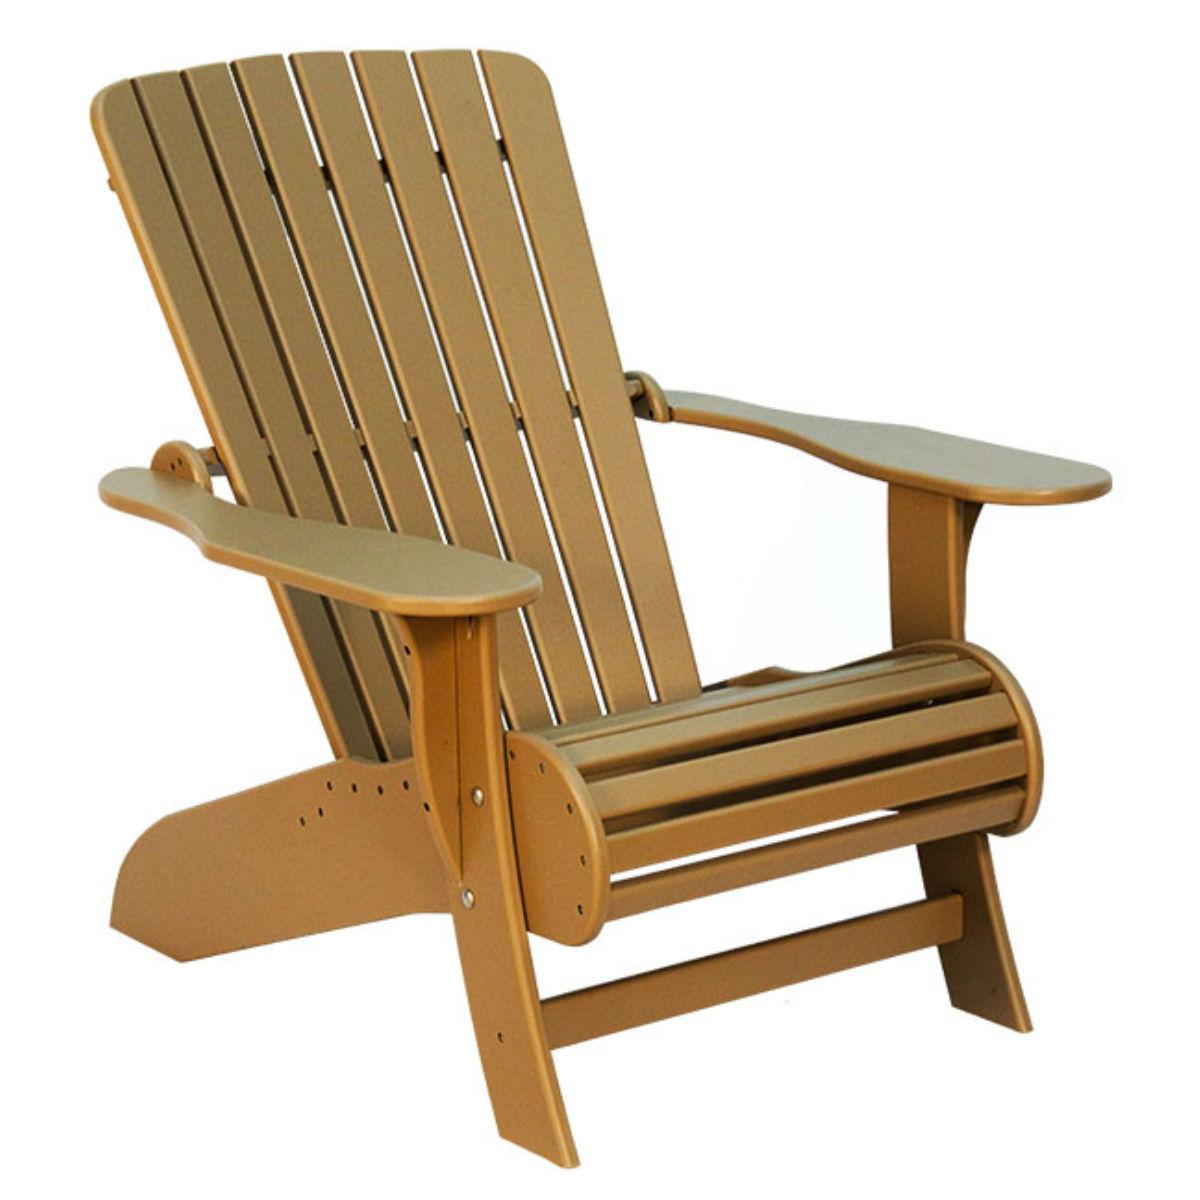 Highlander Muskoka Chair Recycled Patio